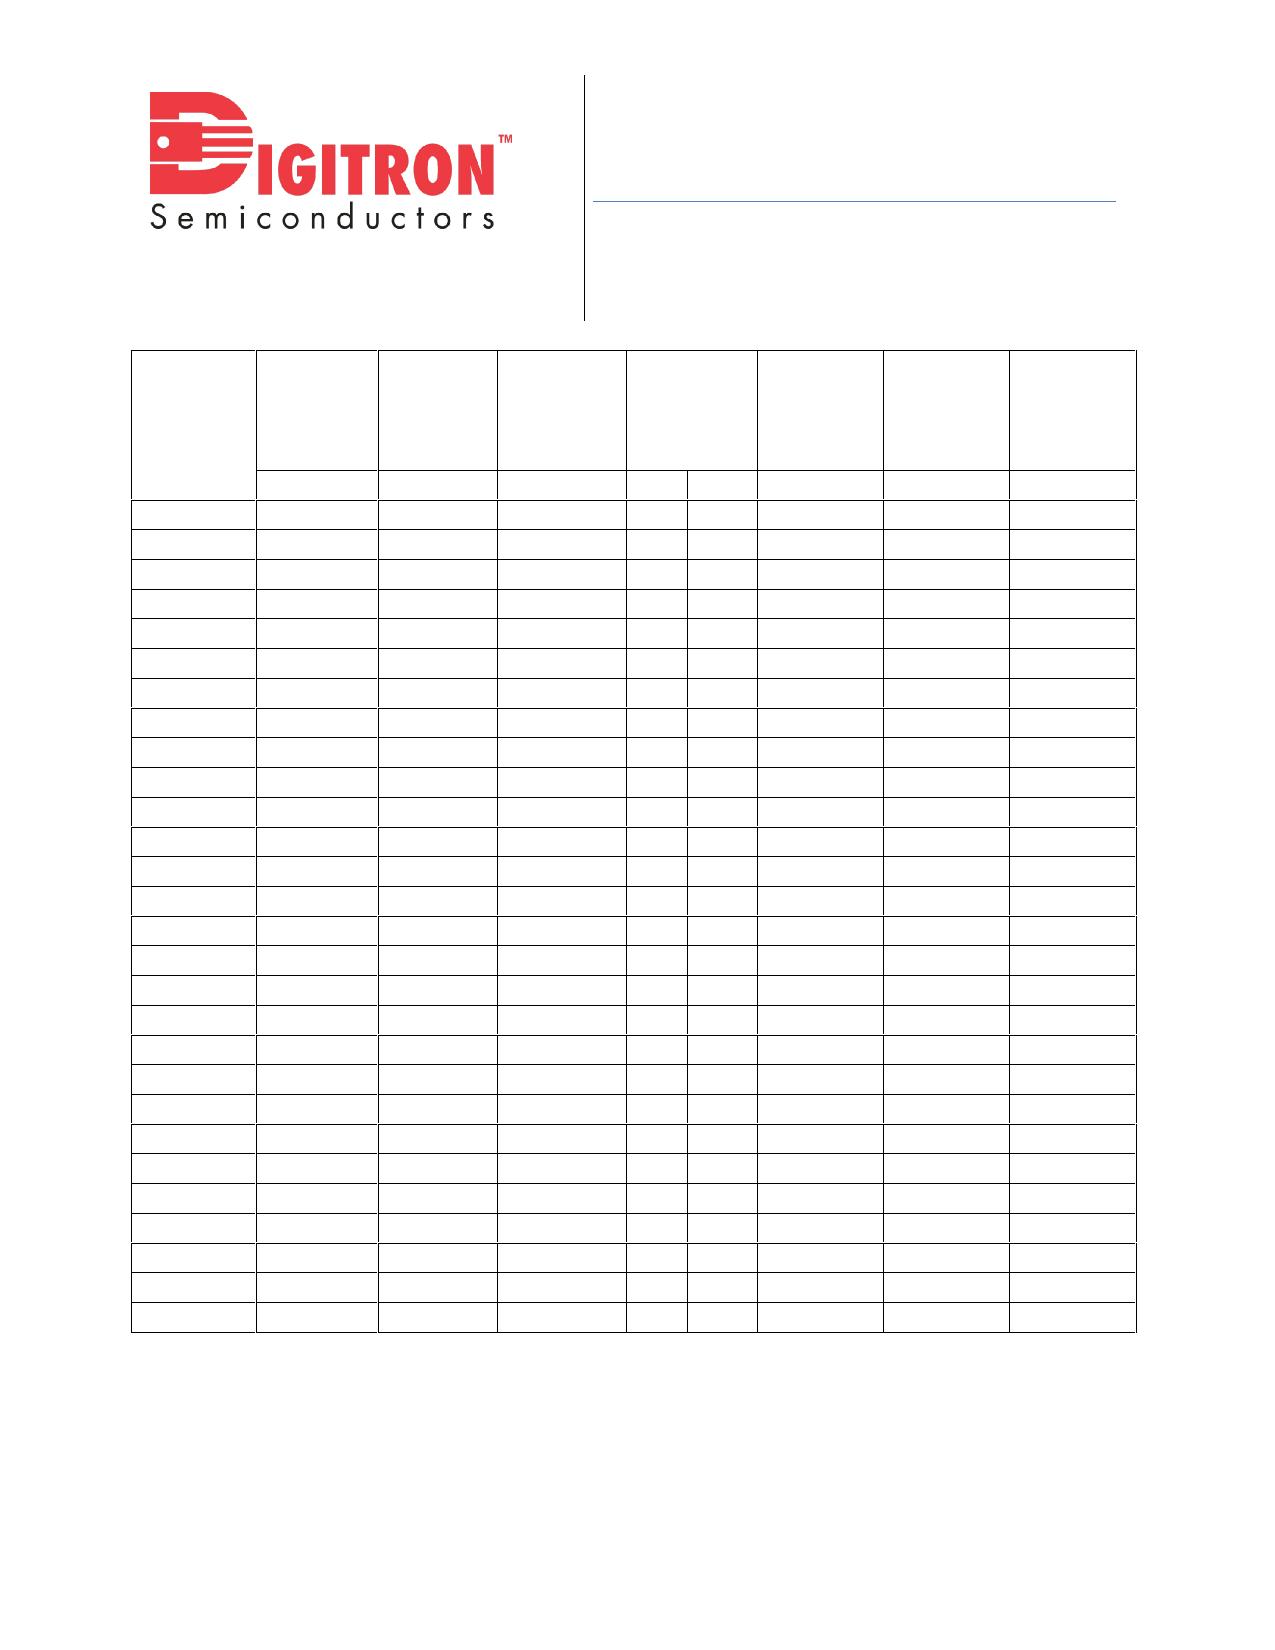 1N4110UR pdf, equivalent, schematic